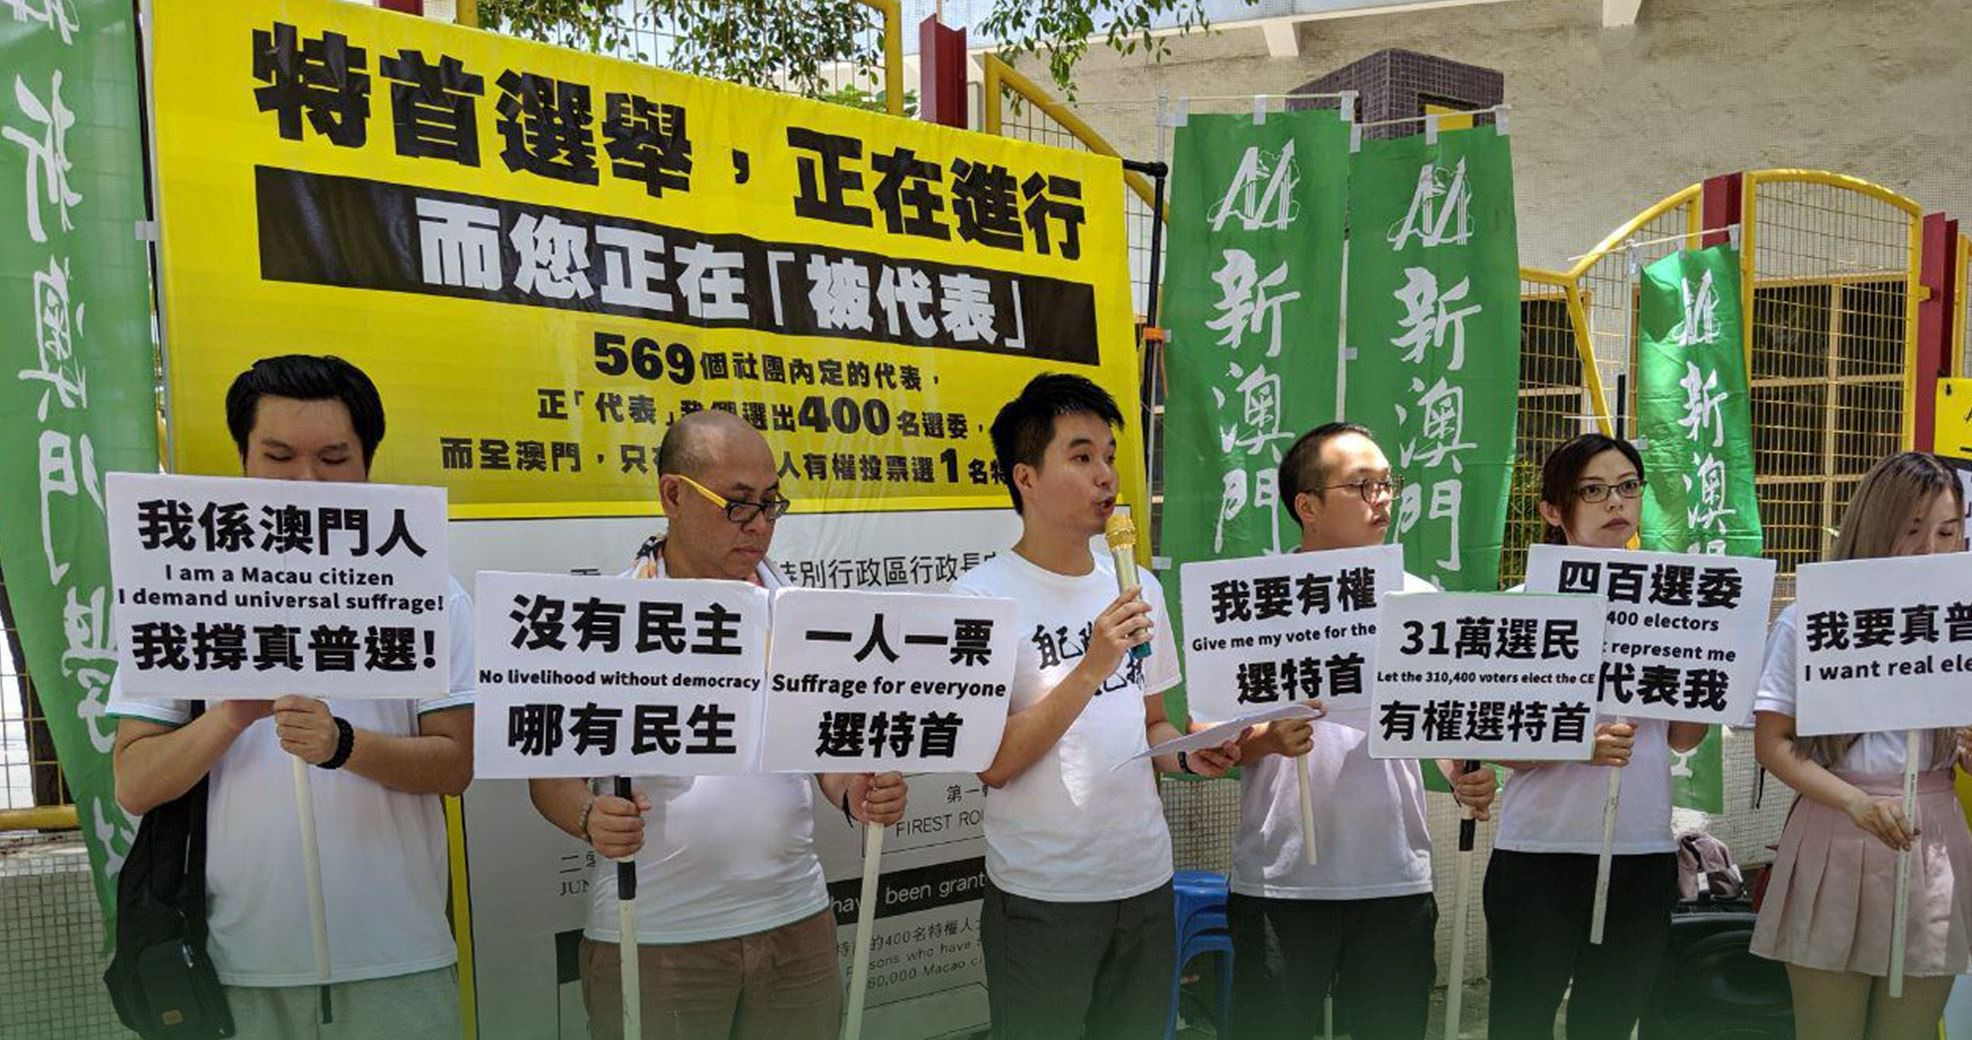 Novo Macau | 94 por cento de apoio ao sufrágio universal apesar dos ataques